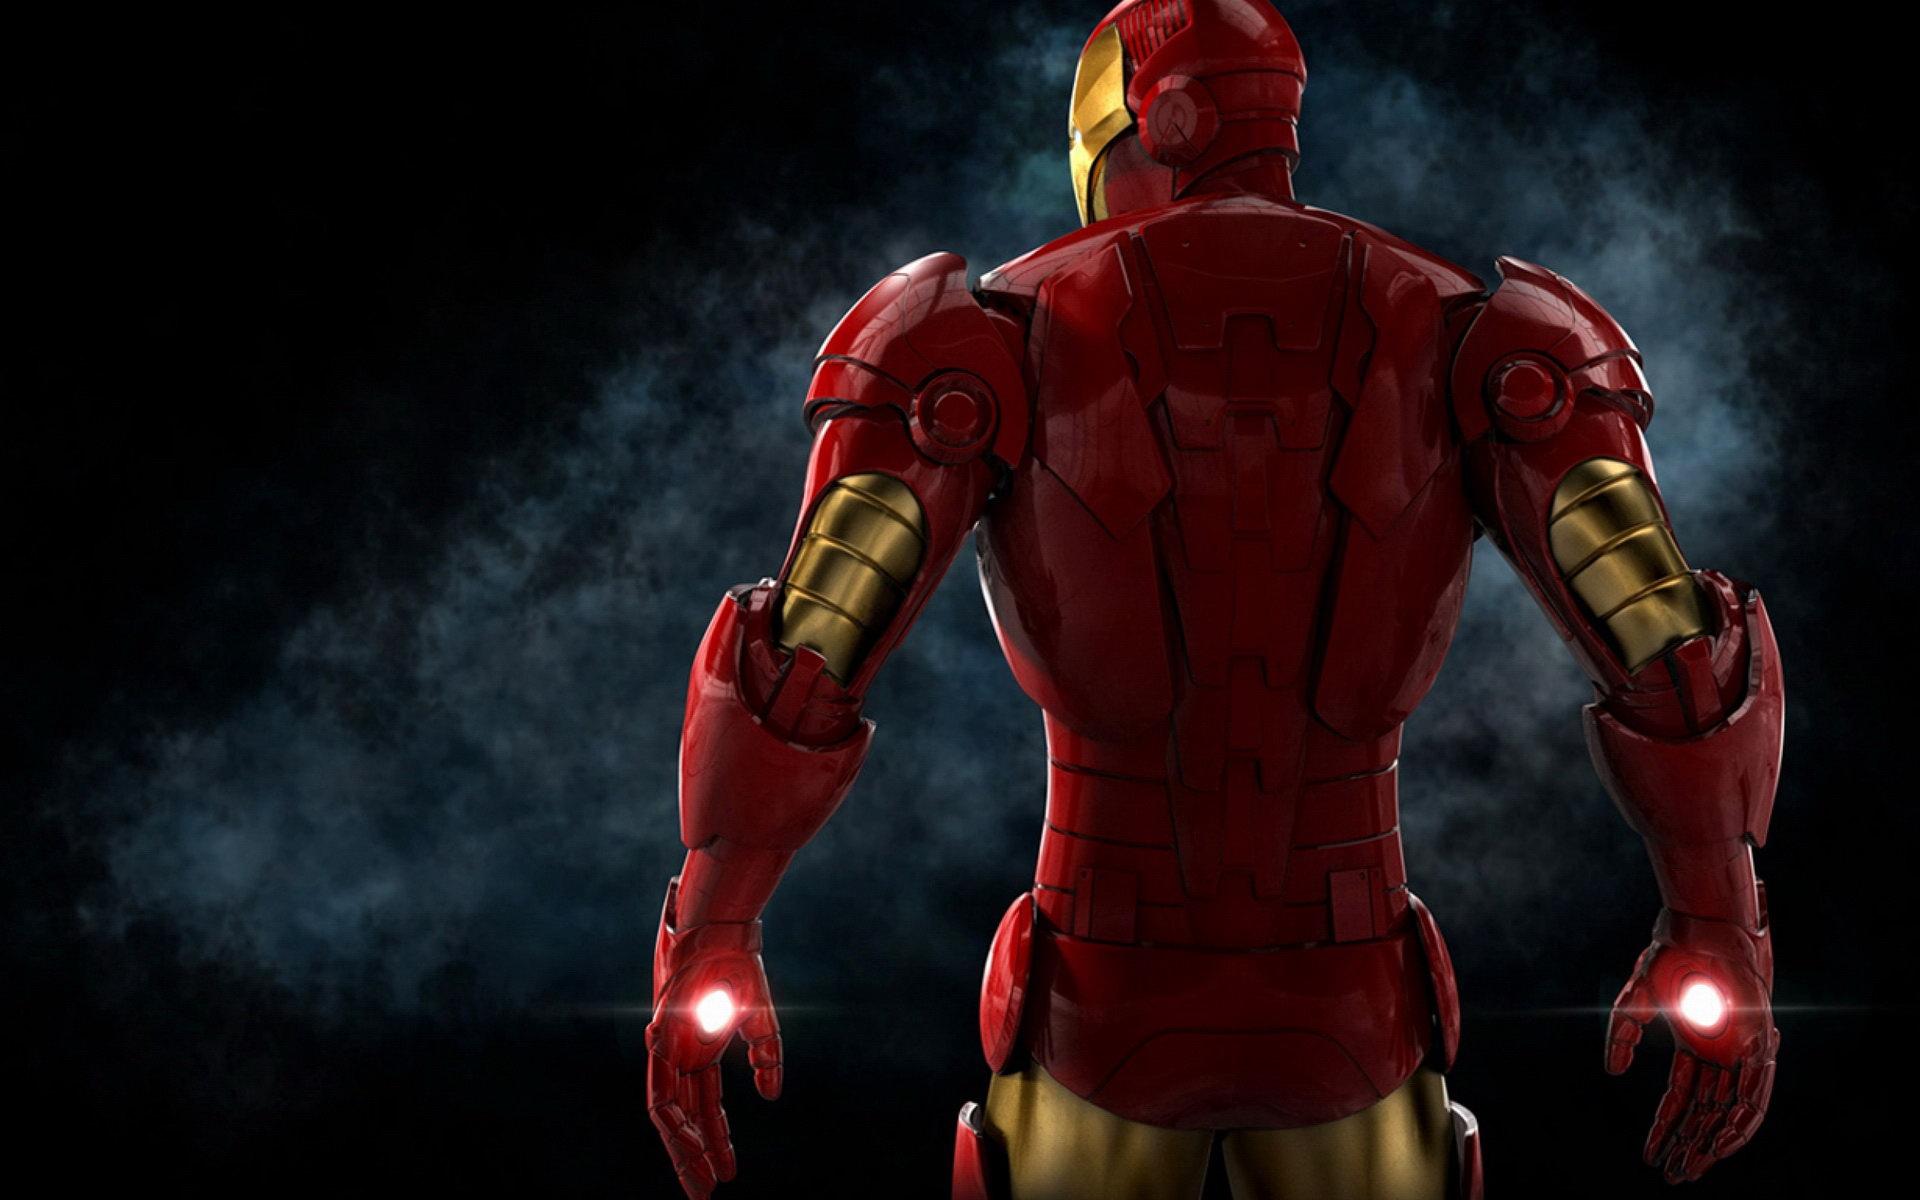 Iron Man wallpaper   987965 1920x1200